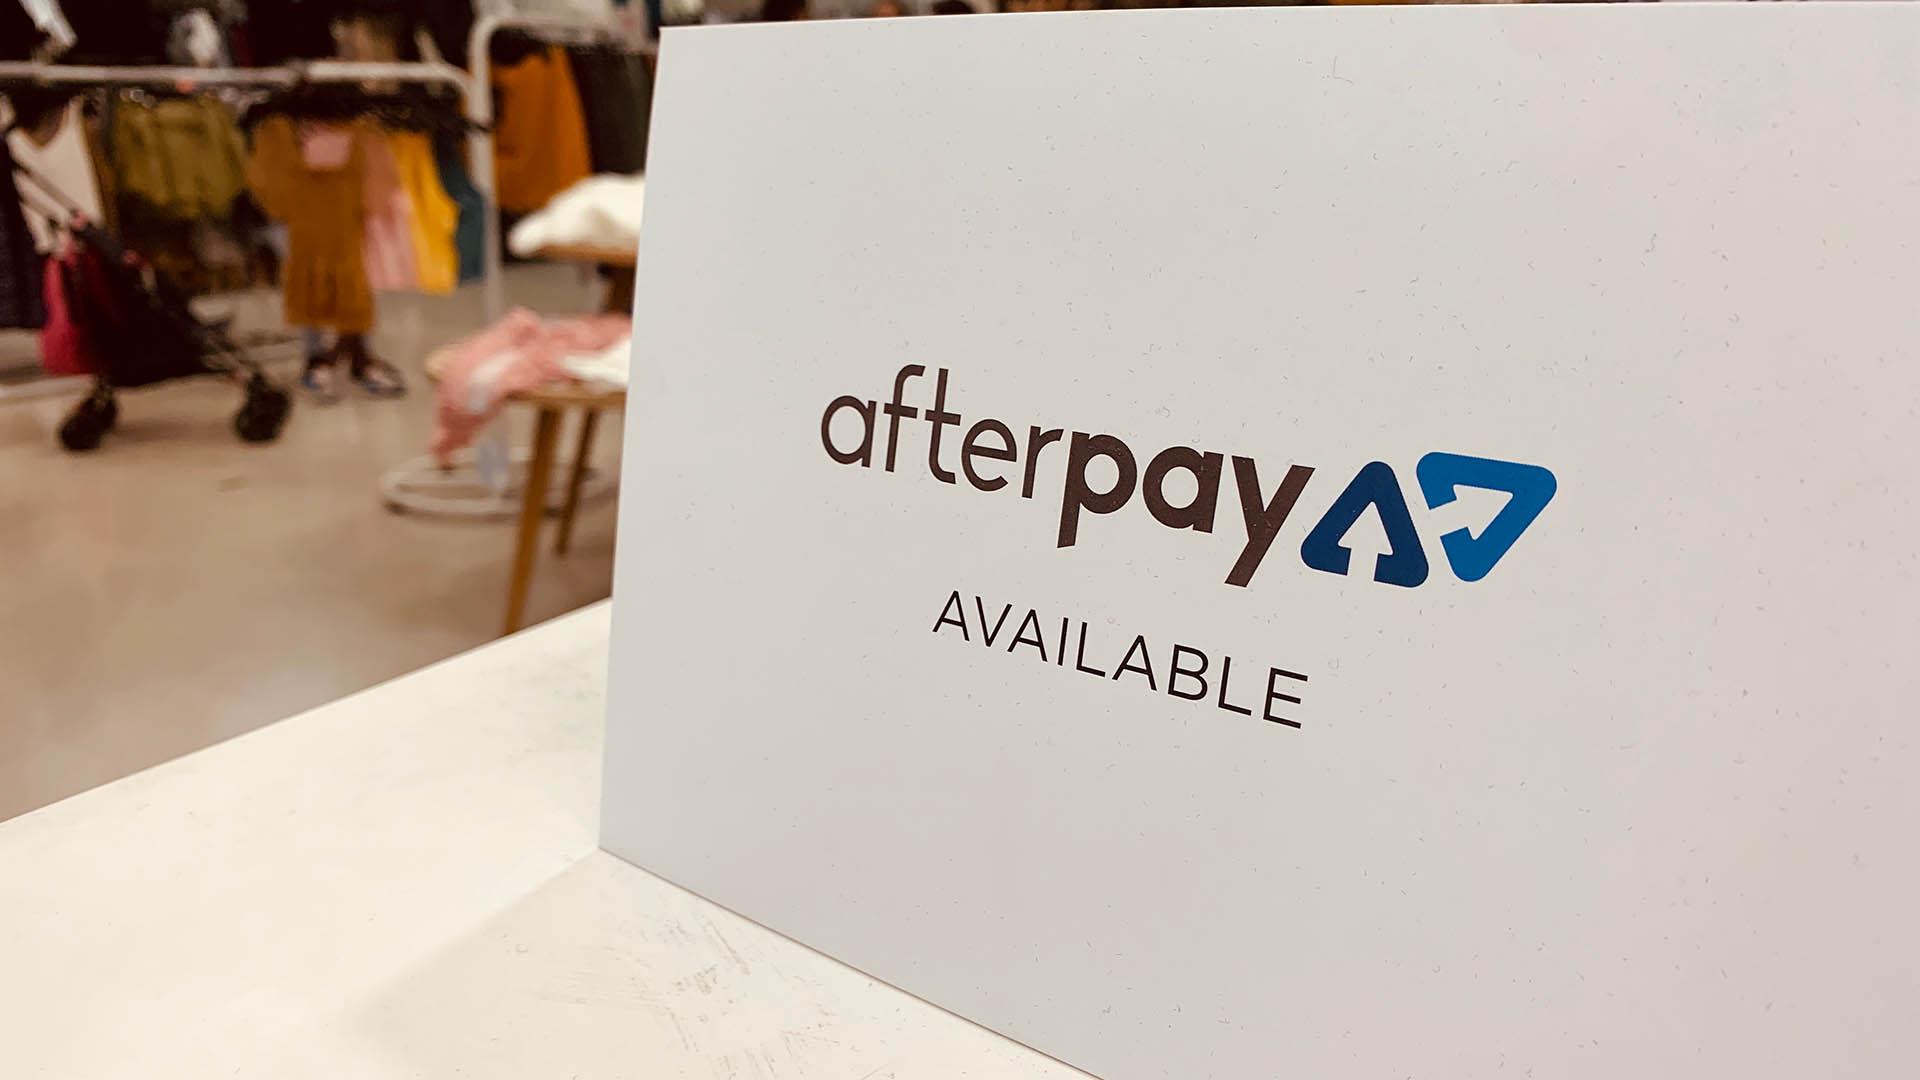 Afterpay (ASX:APT) raises $136 million from retail investors